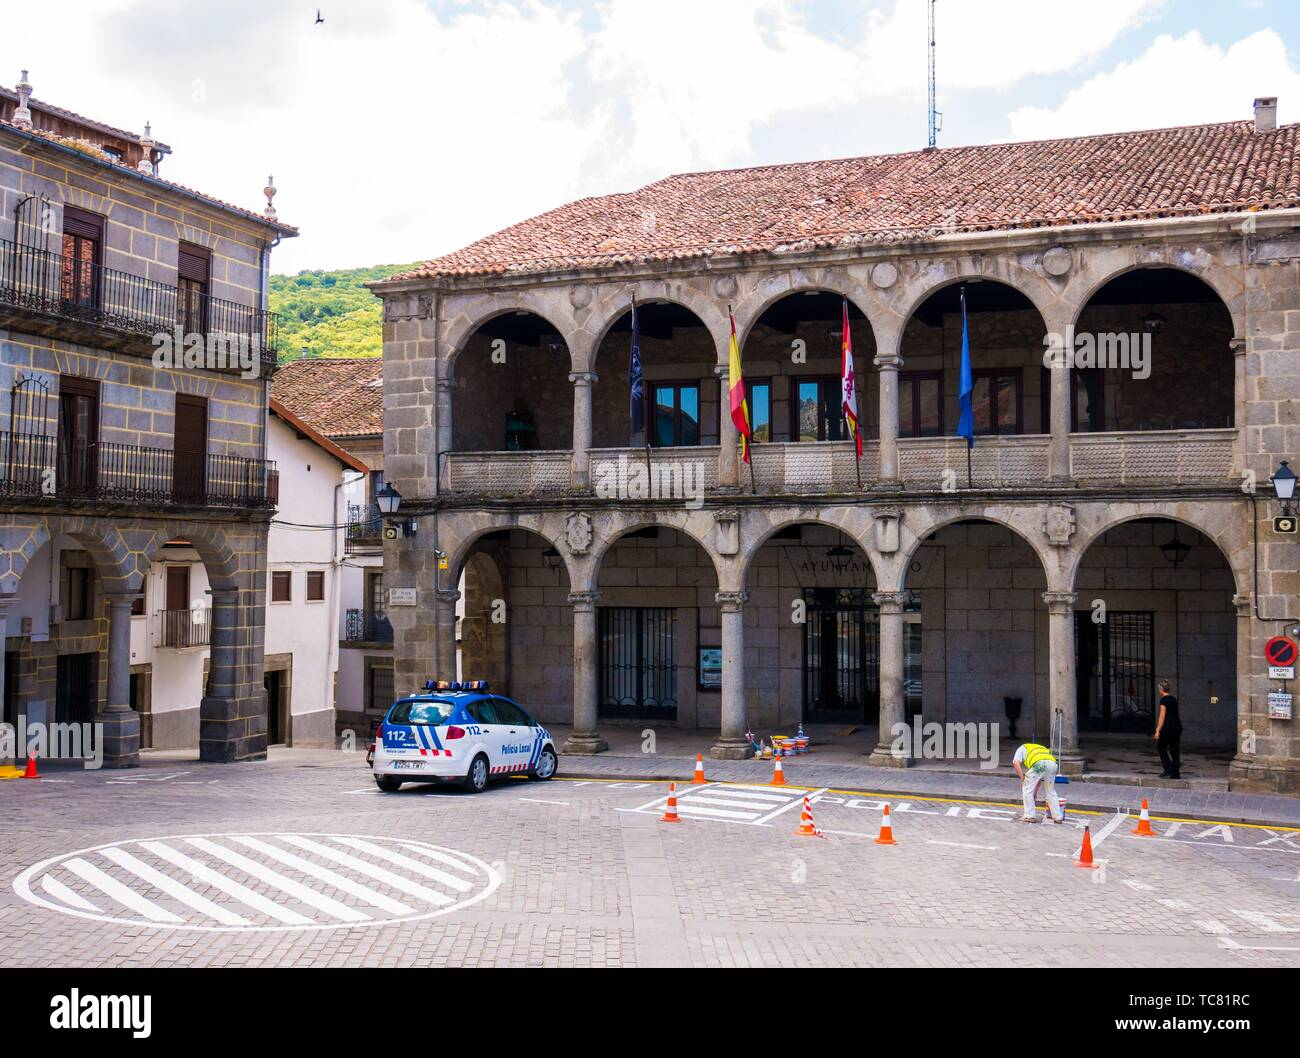 Promover boicotear mucho  Ayuntamiento de Béjar. Salamanca. Castilla León. España Stock Photo - Alamy